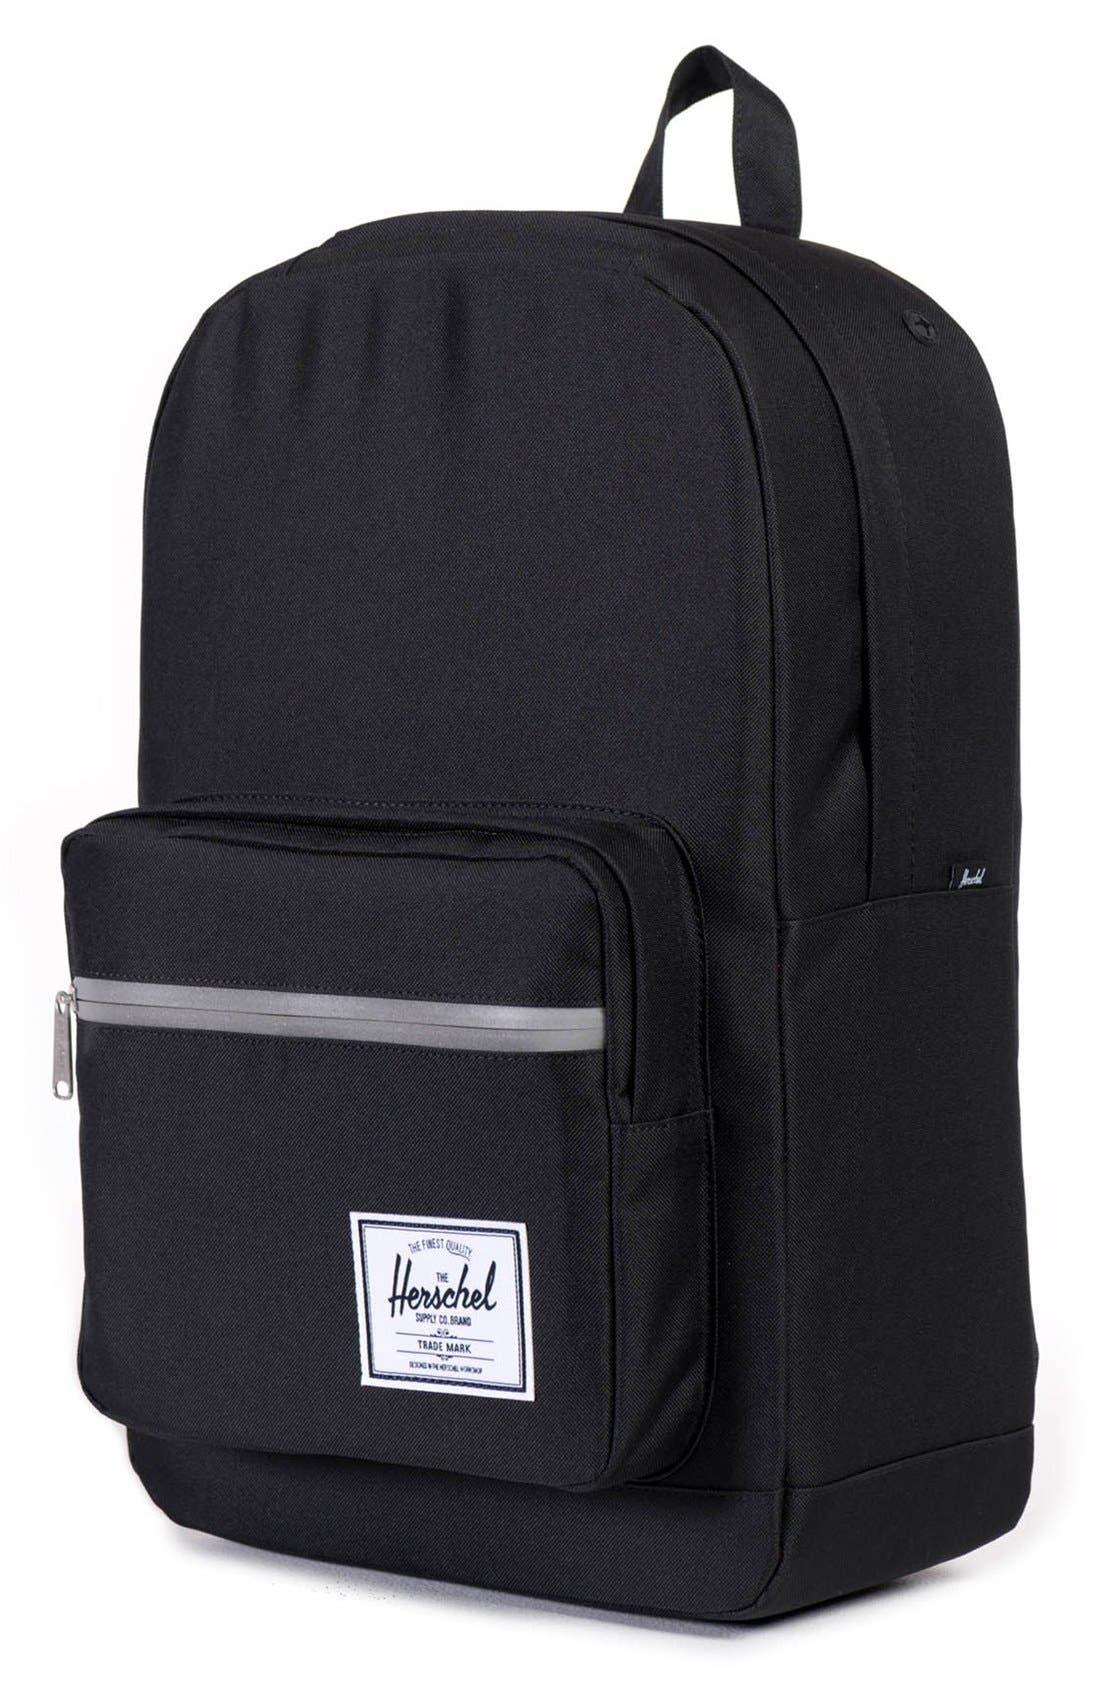 'Pop Quiz' Backpack,                             Alternate thumbnail 4, color,                             Black/ 3M